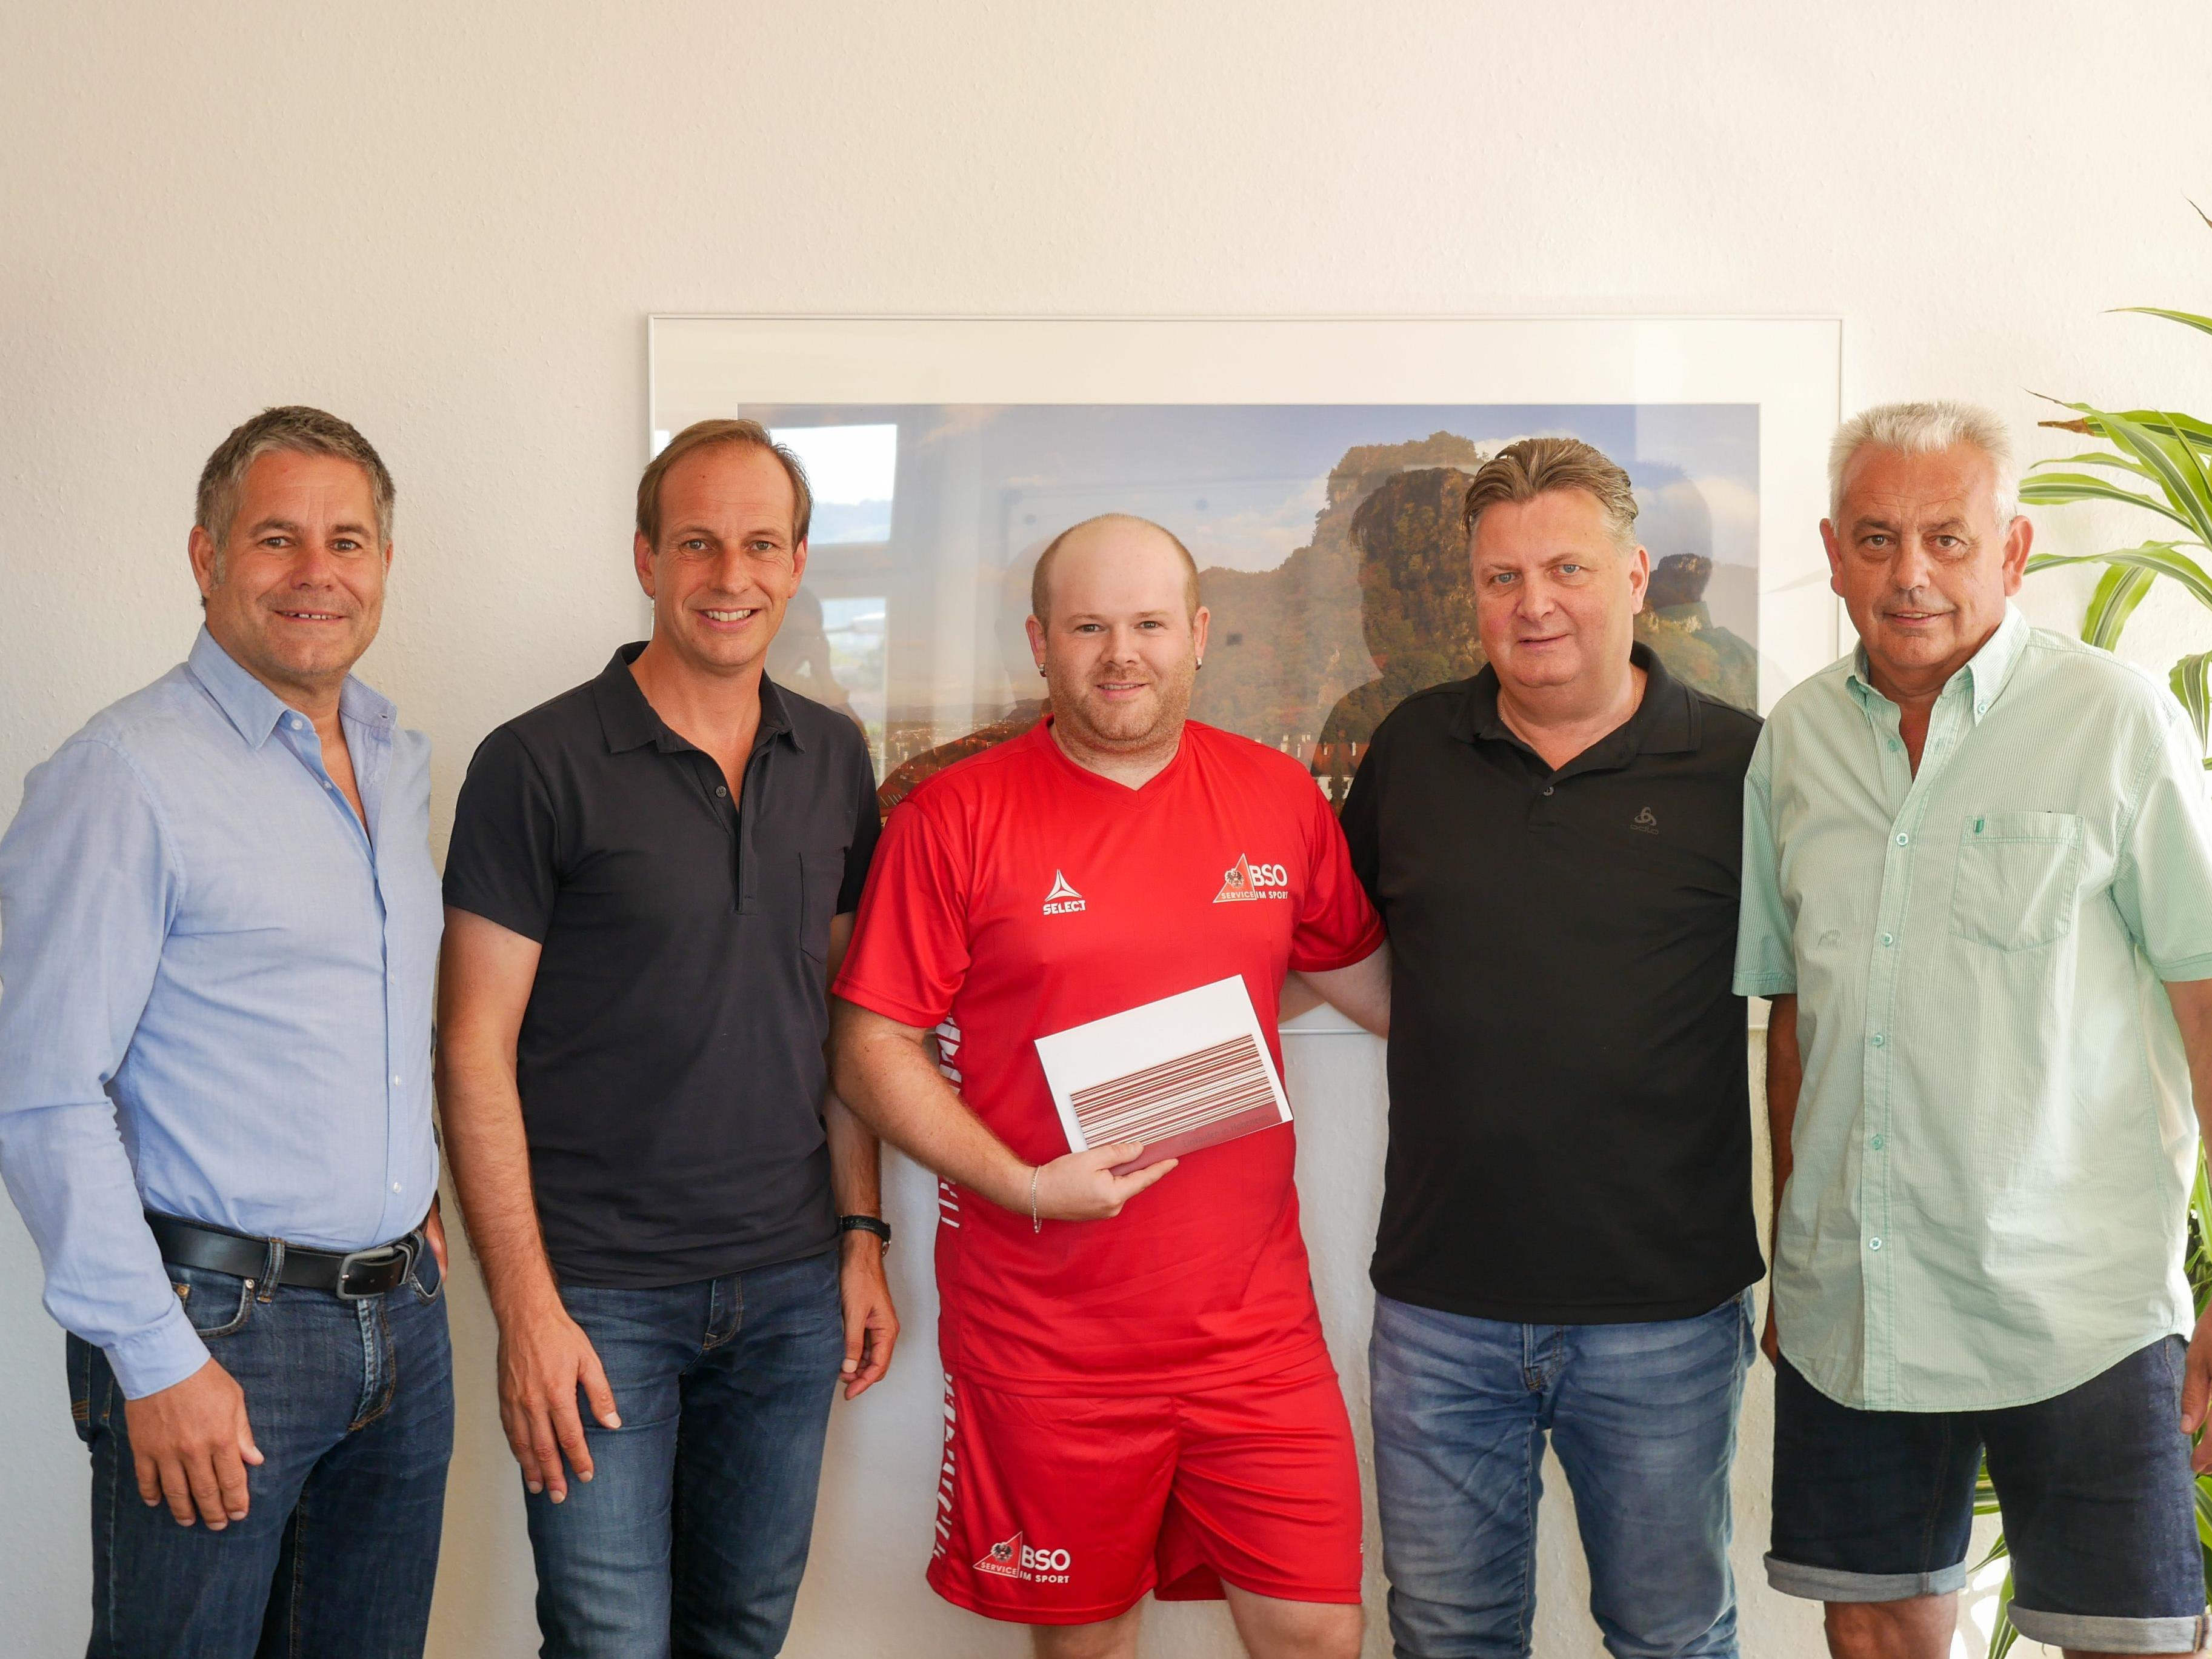 v. l. Michael Derka, Bürgermeister Dieter Egger, Philipp Wolfgang, StR. Friedl Dold und Kurt Luif